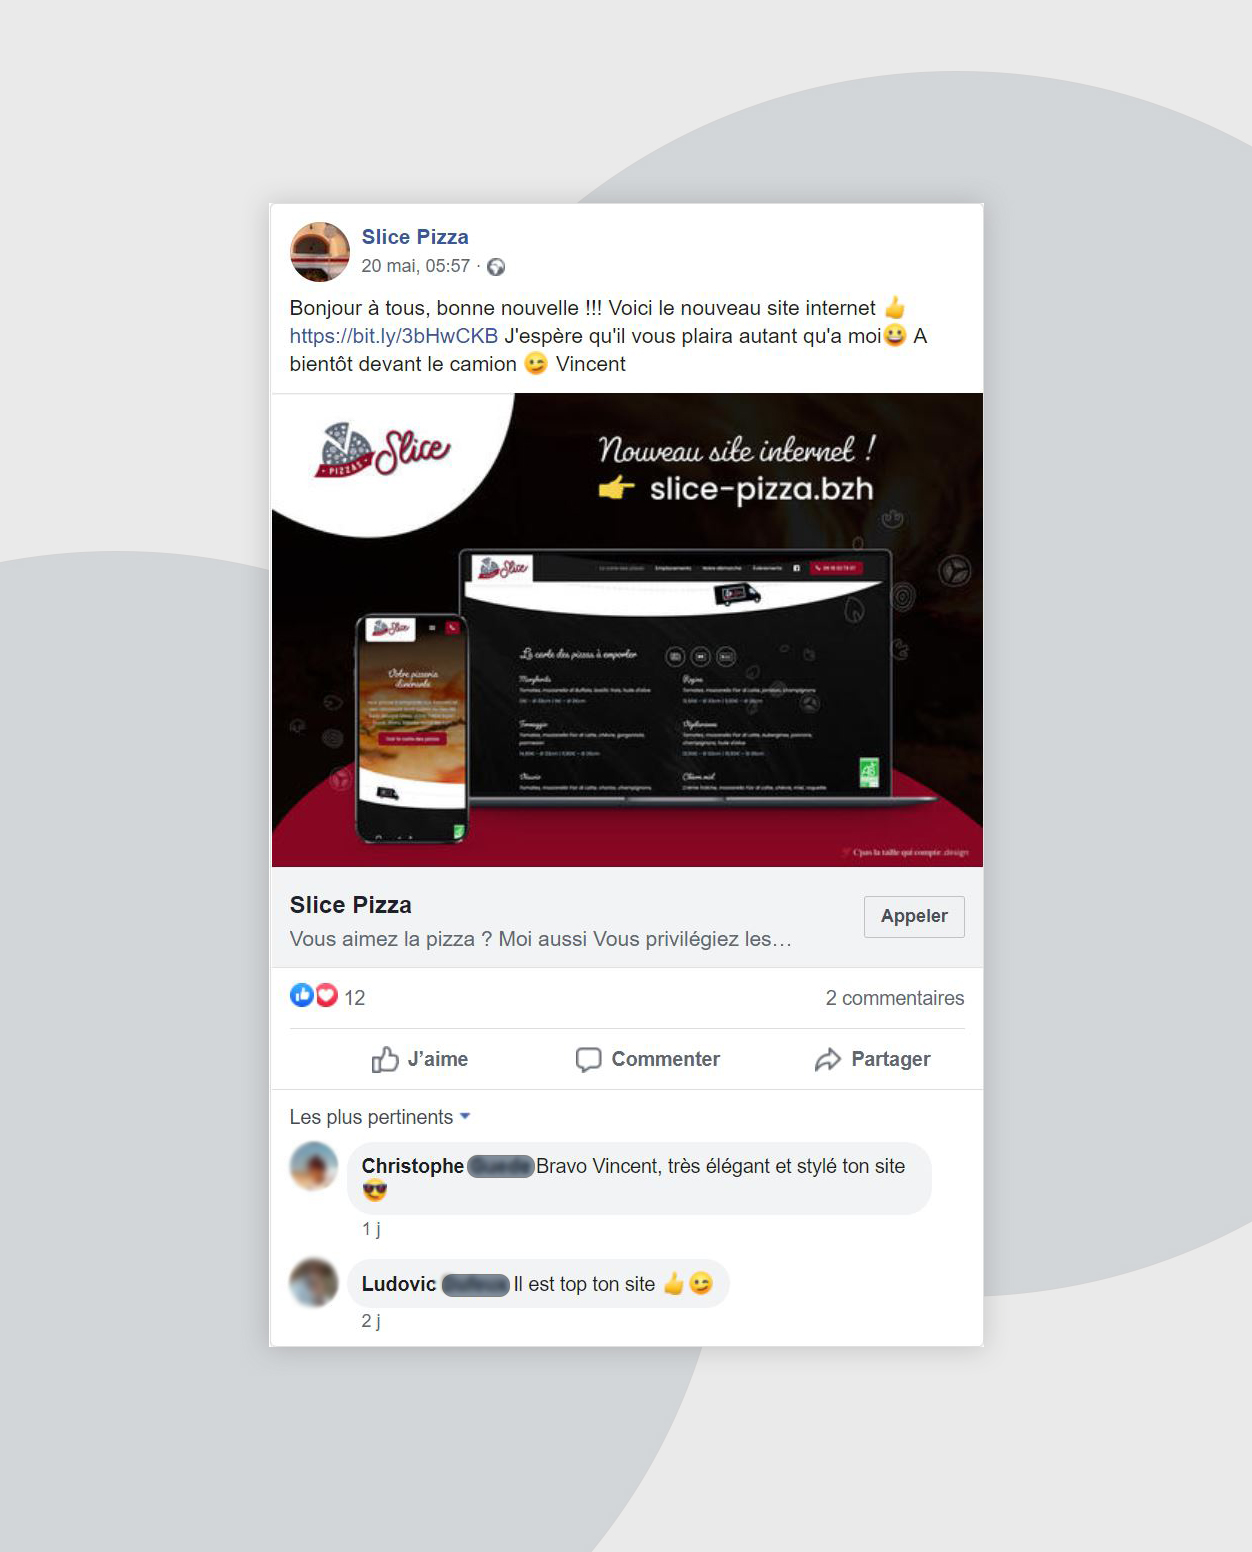 Slice Pizzas post Facebook